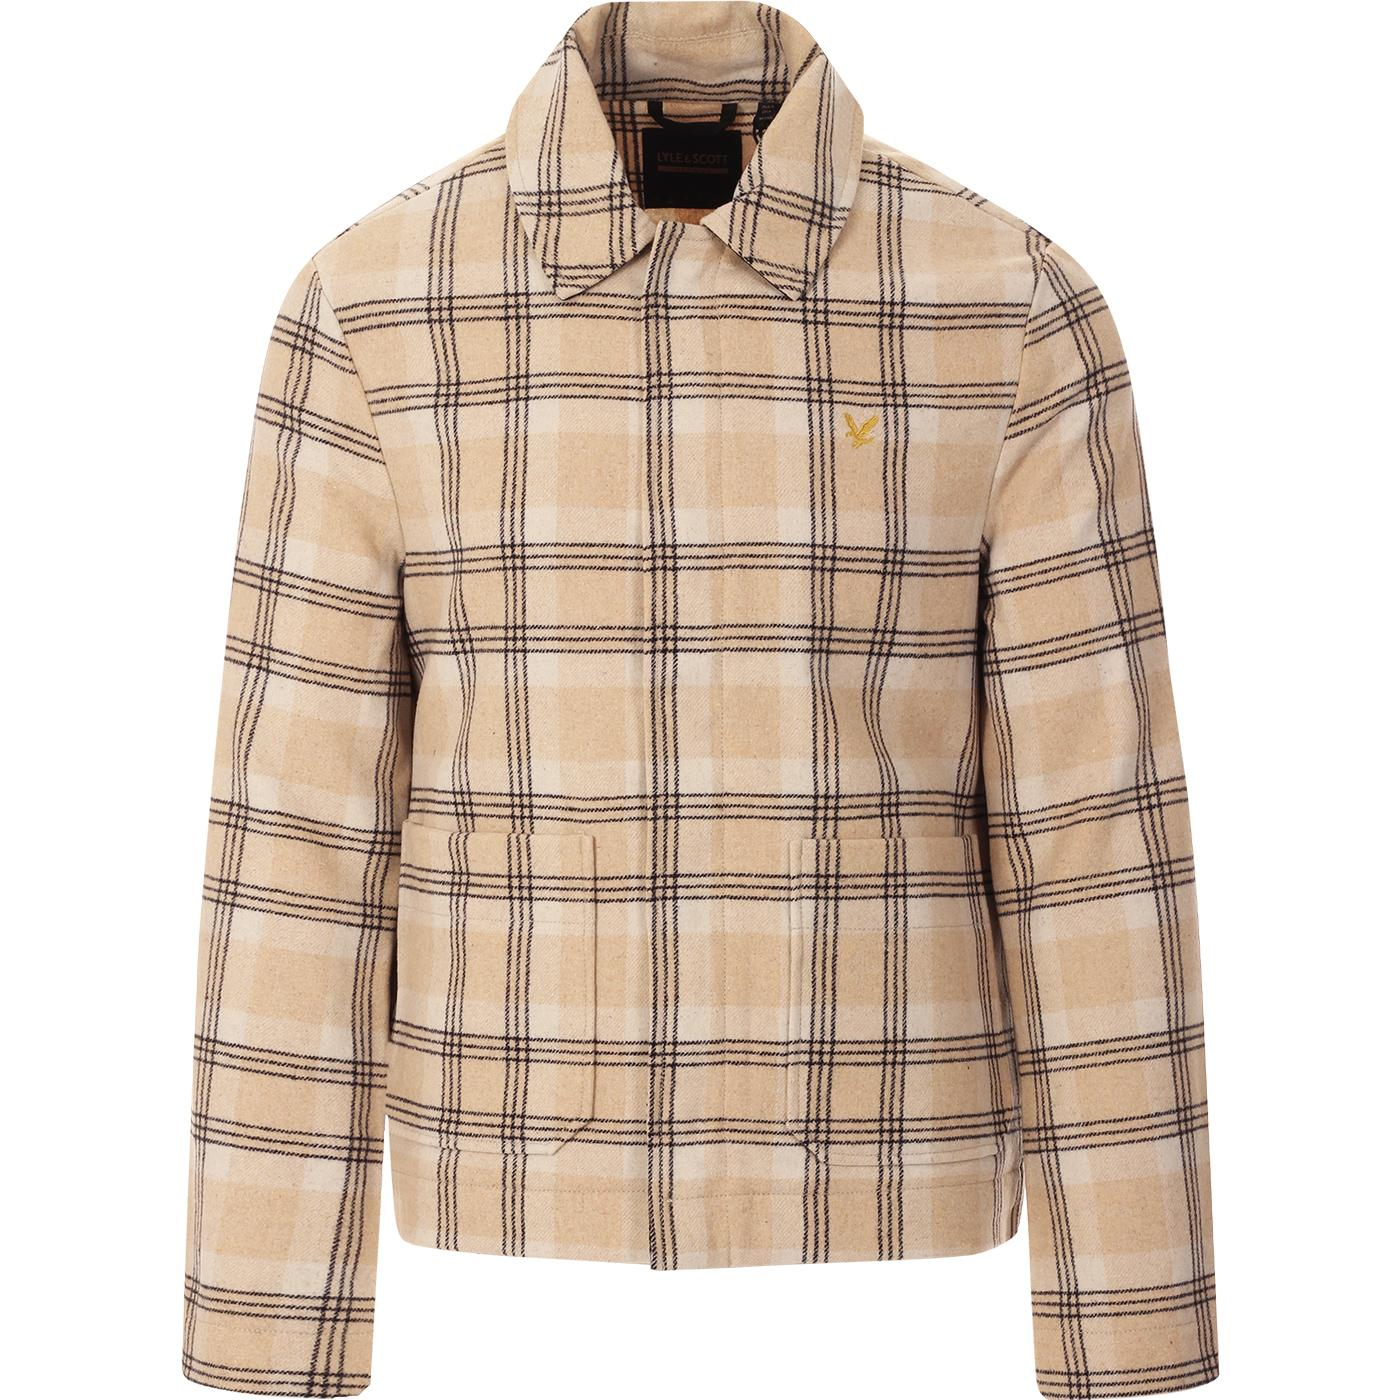 LYLE & SCOTT Archive 70s Wool Check Jacket (VI)